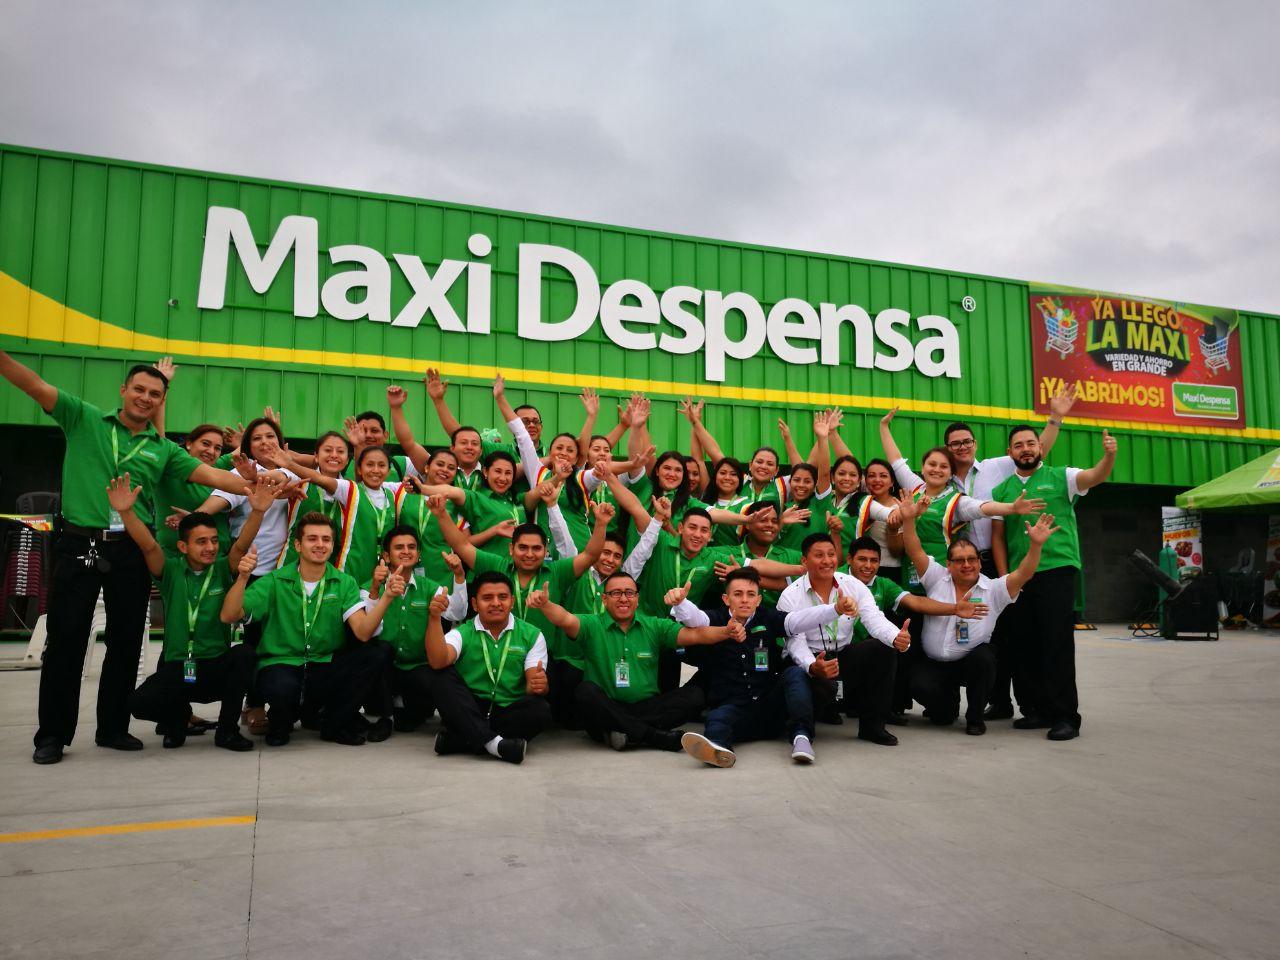 Maxi despensa villa nueva - 2 2